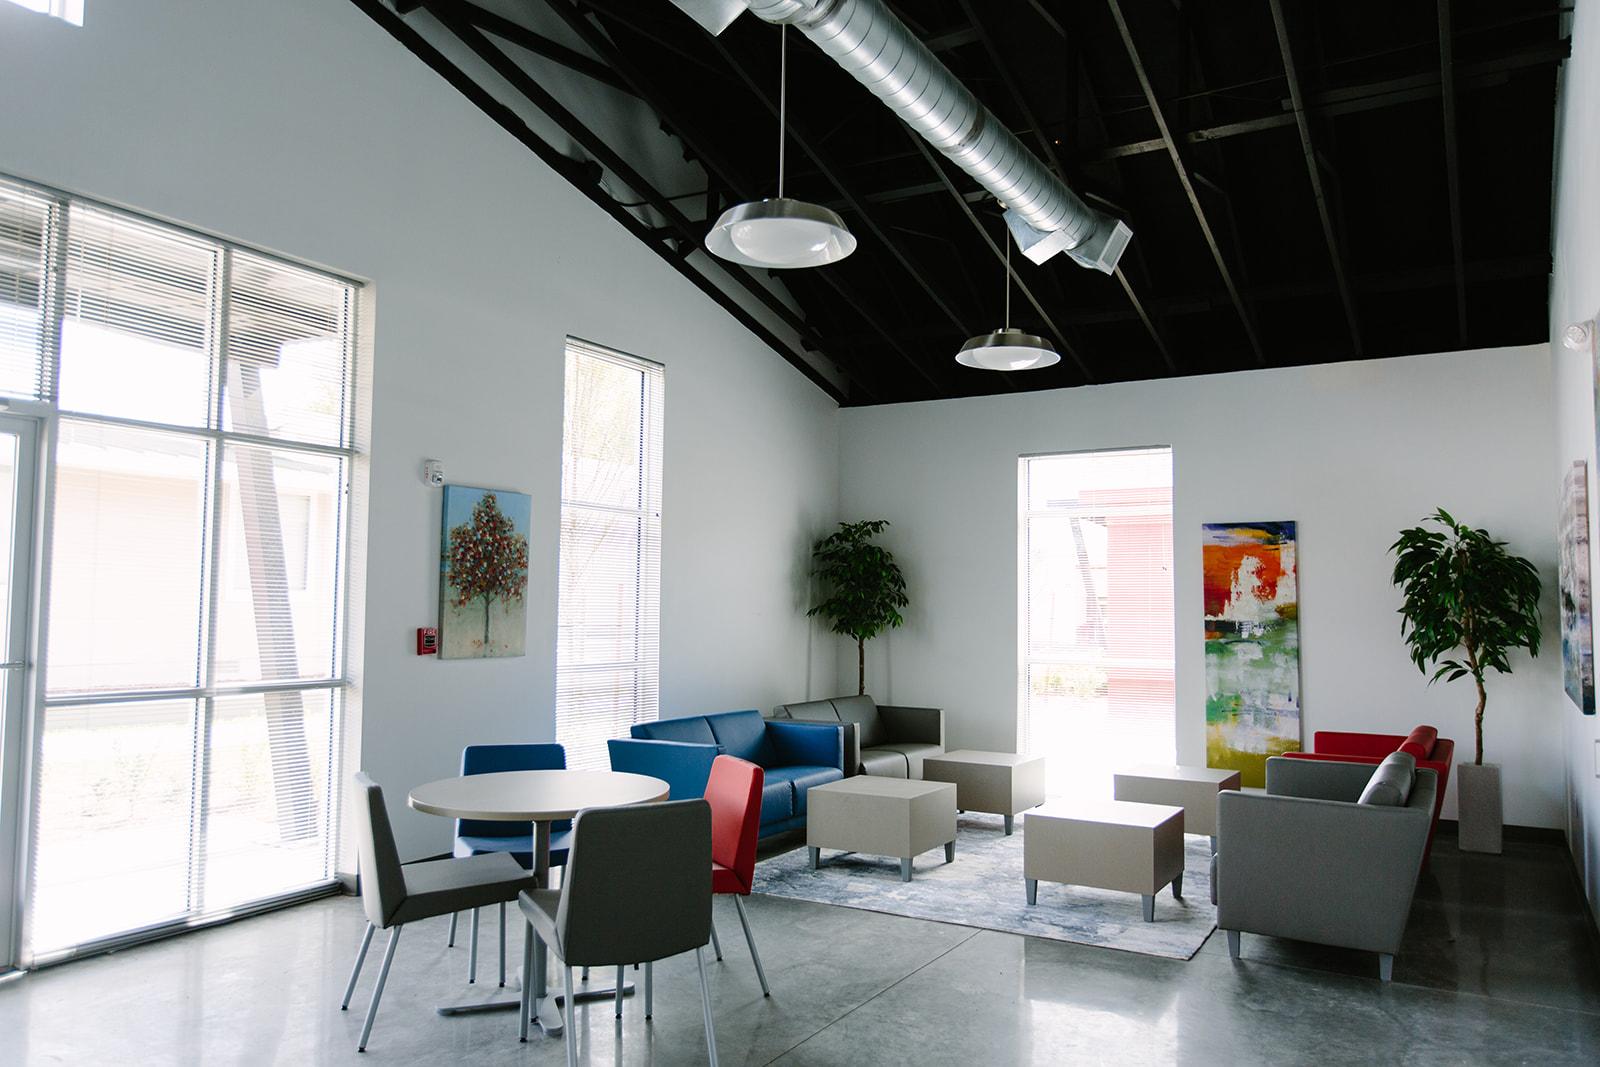 Teen Challenge Office and Dormitories